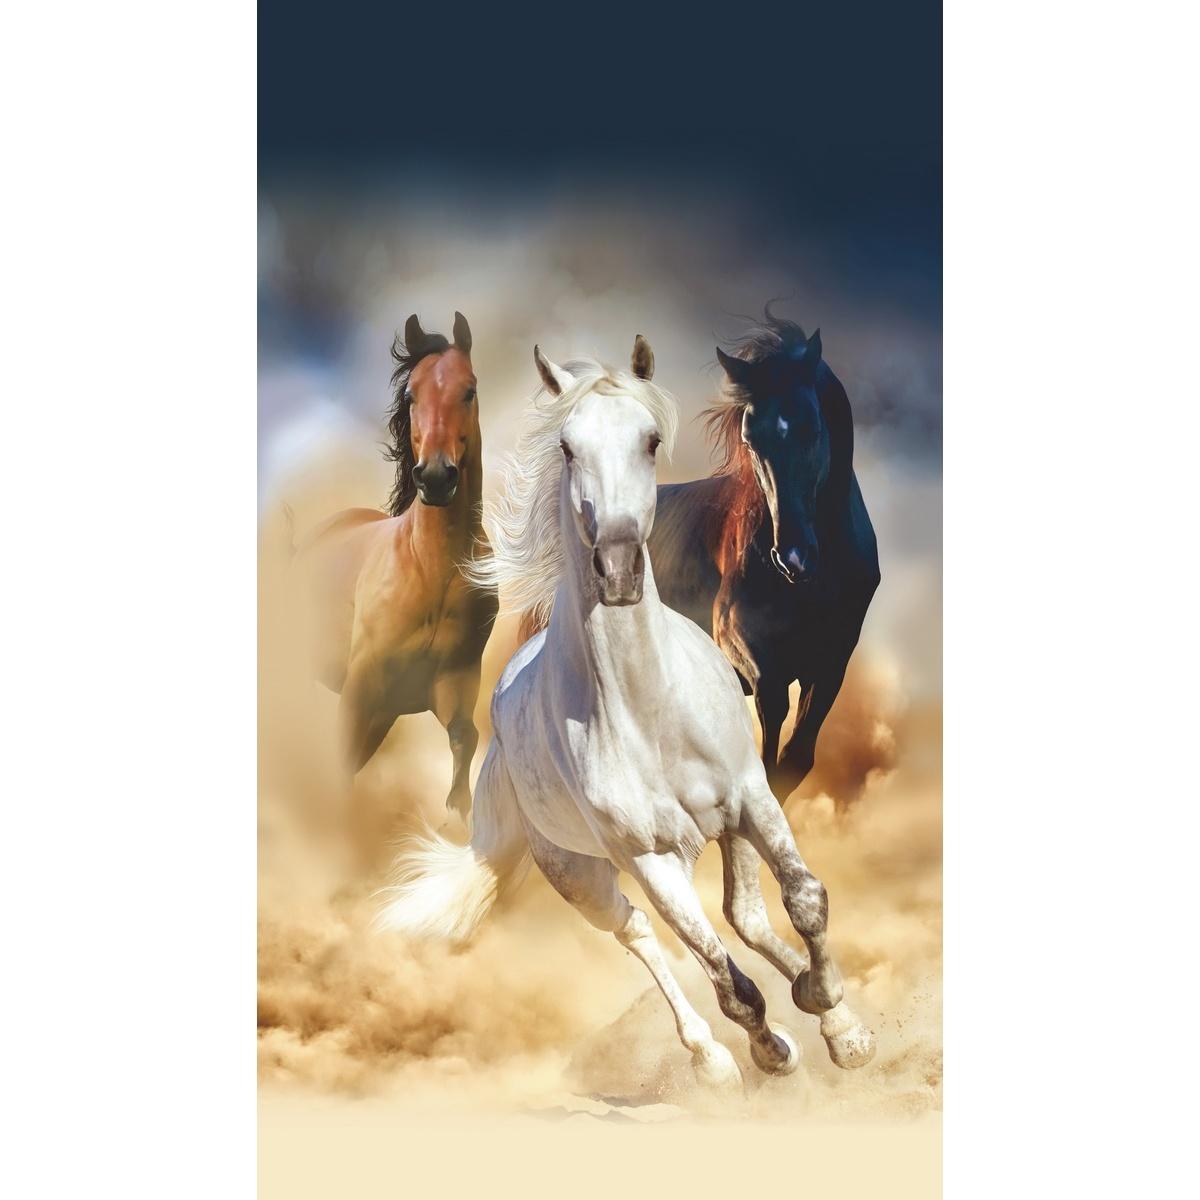 Tapeta fotograficzna pionowa Horses, 90 x 202 cm